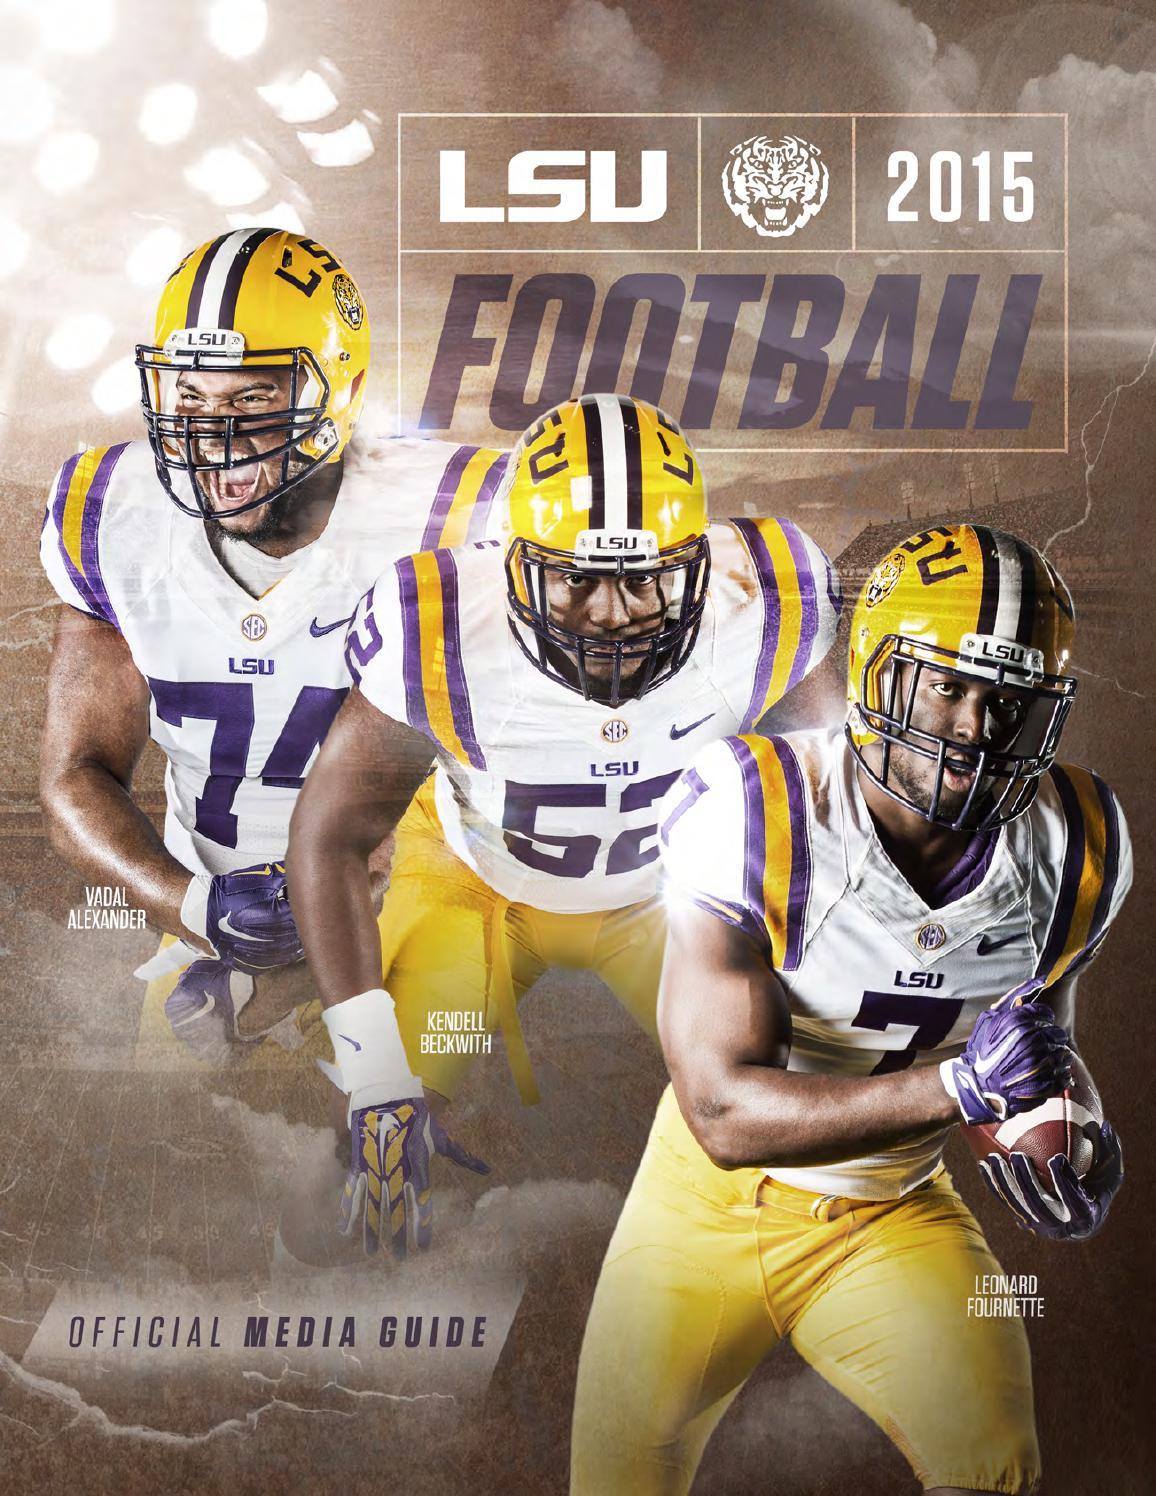 2015 lsu football media guide by lsu